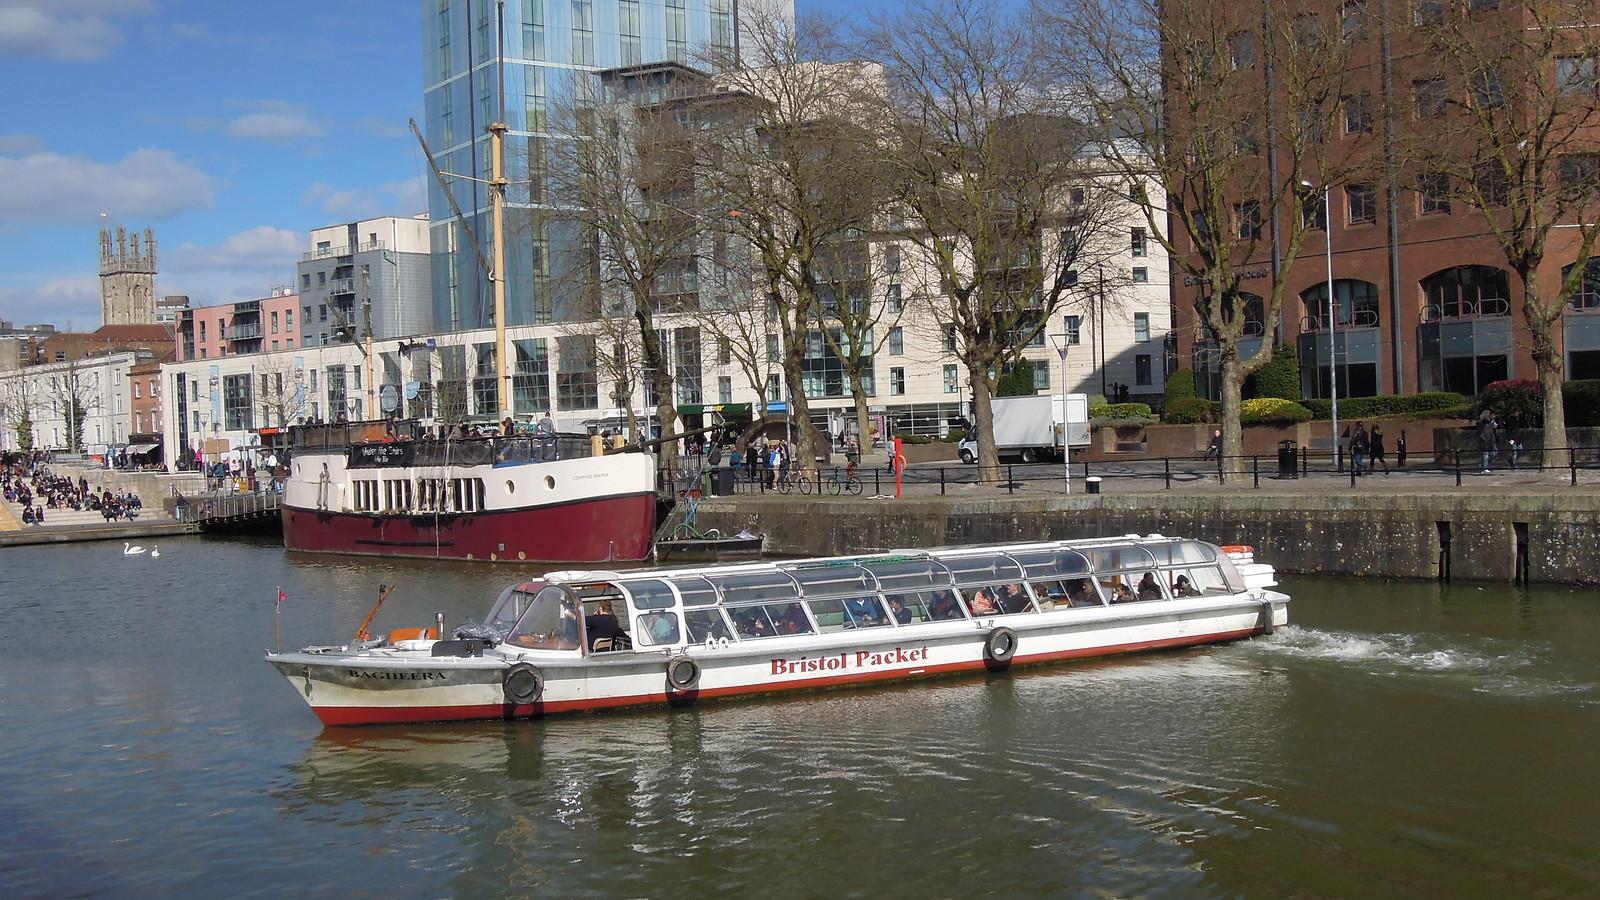 Bagheera, Bristol Packet Boat Trips, Bristol Harbour, Engl